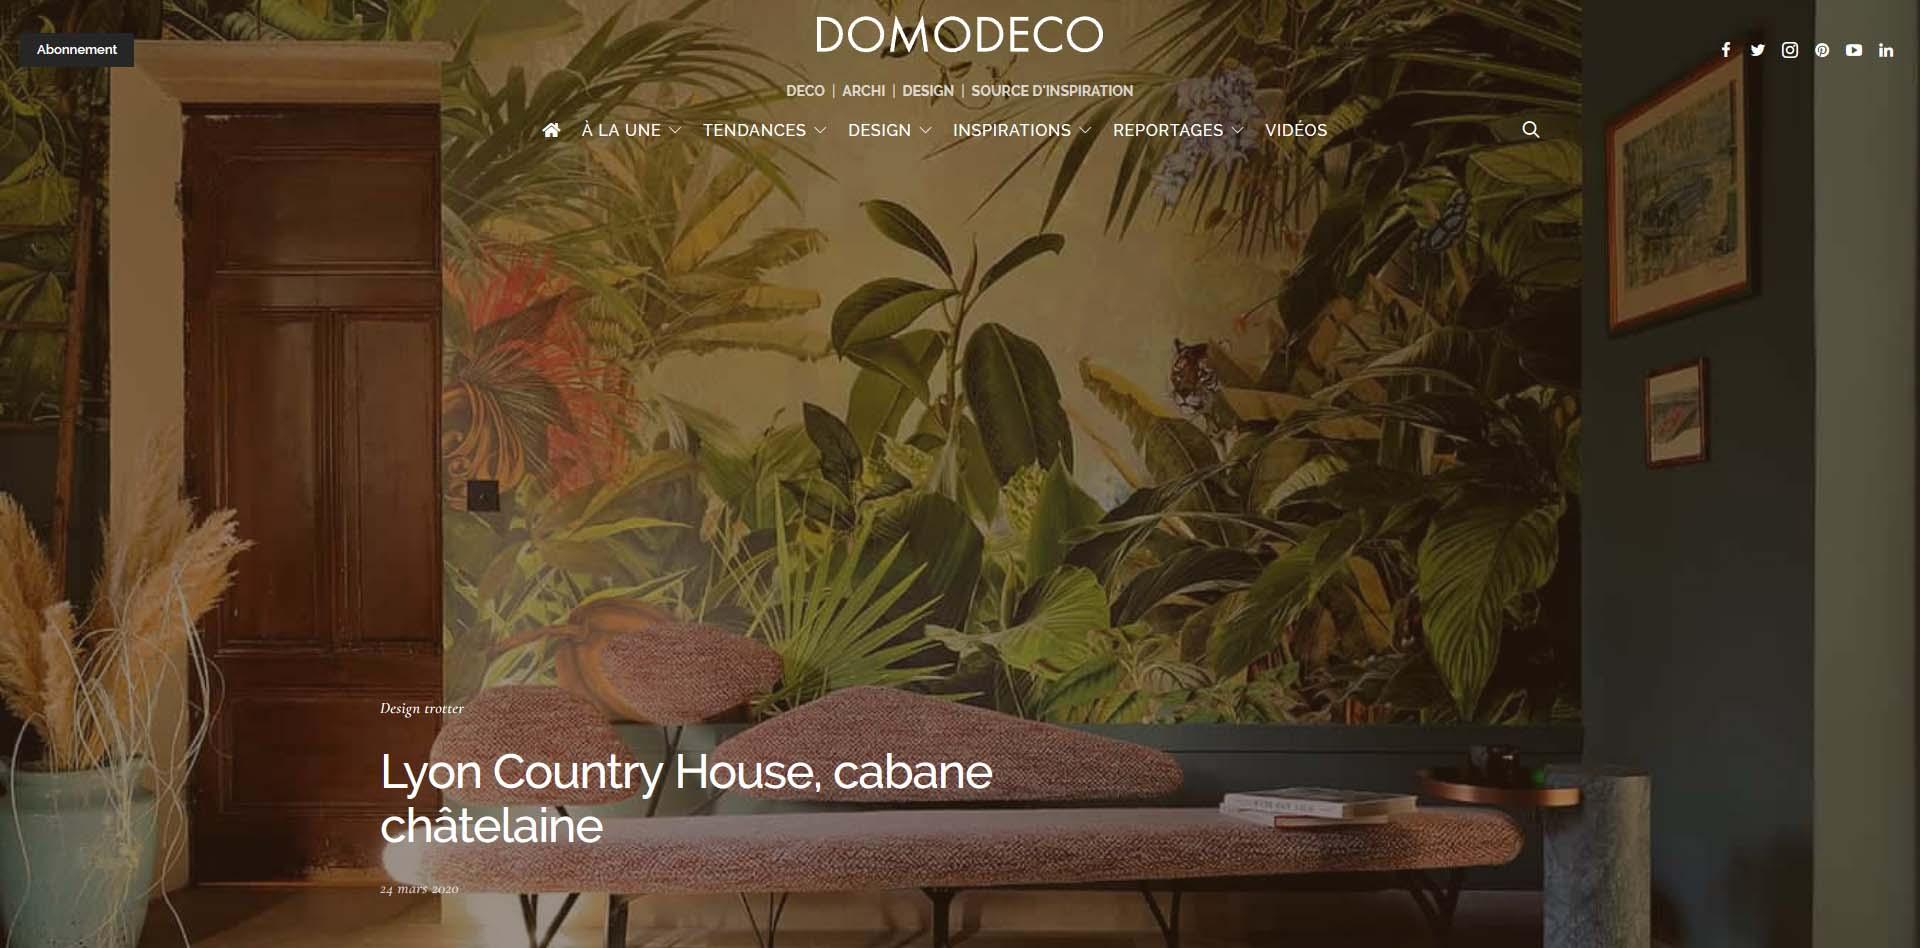 Capture-ecran-article-domodeco-juin-2020-1